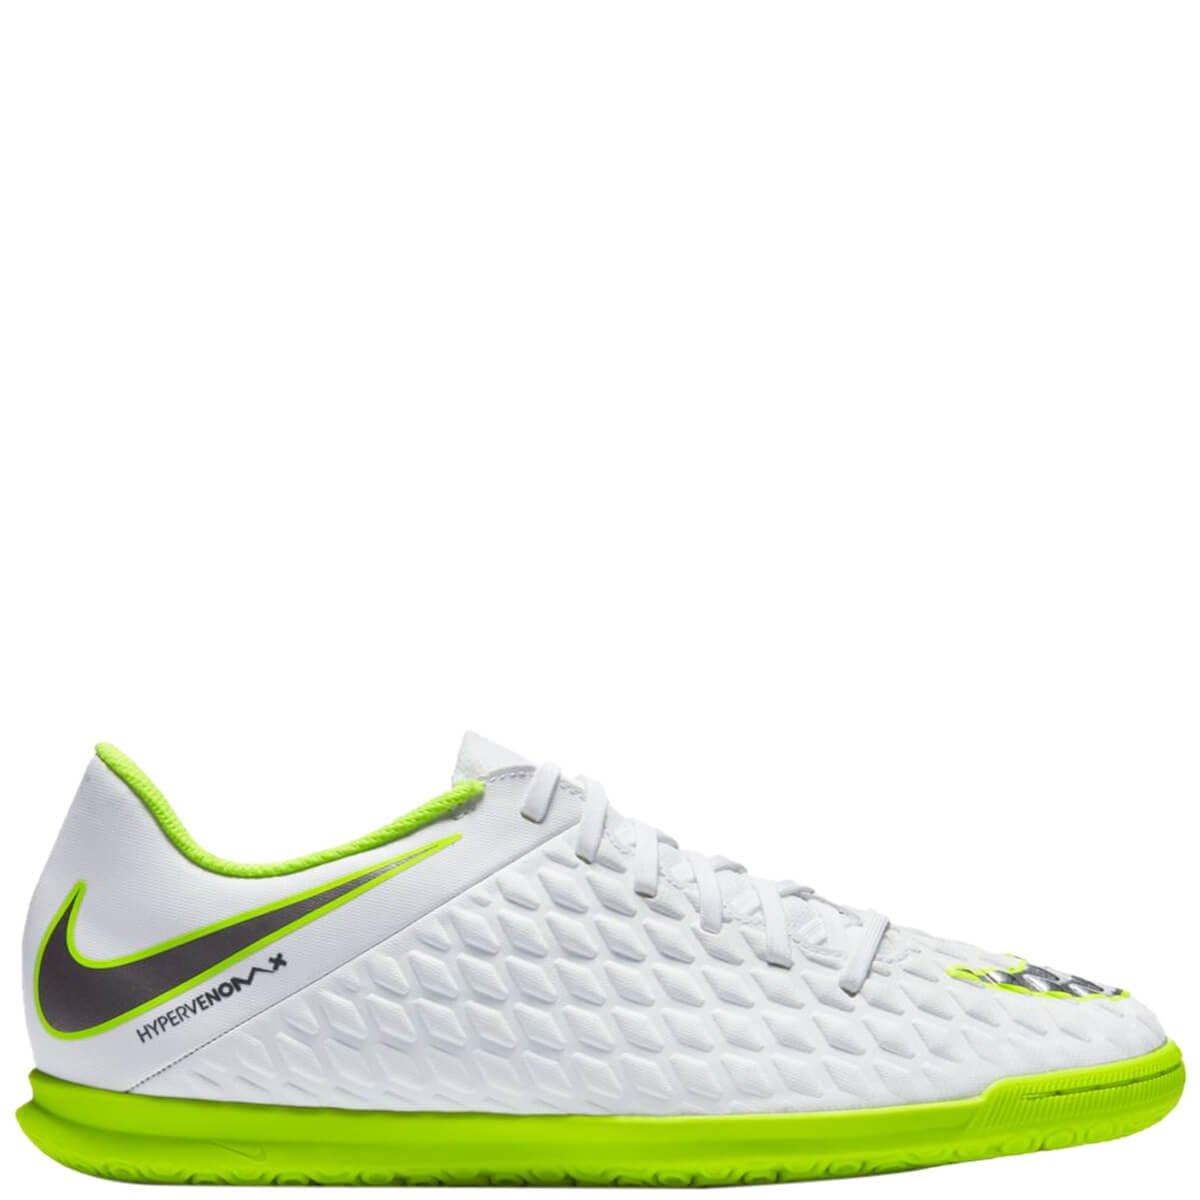 ... Bizz Store - Chuteira Futsal Nike Hypervenomx Phantom 3 Club  f5e0673d2b5784  Tênis ... 7bc72702642